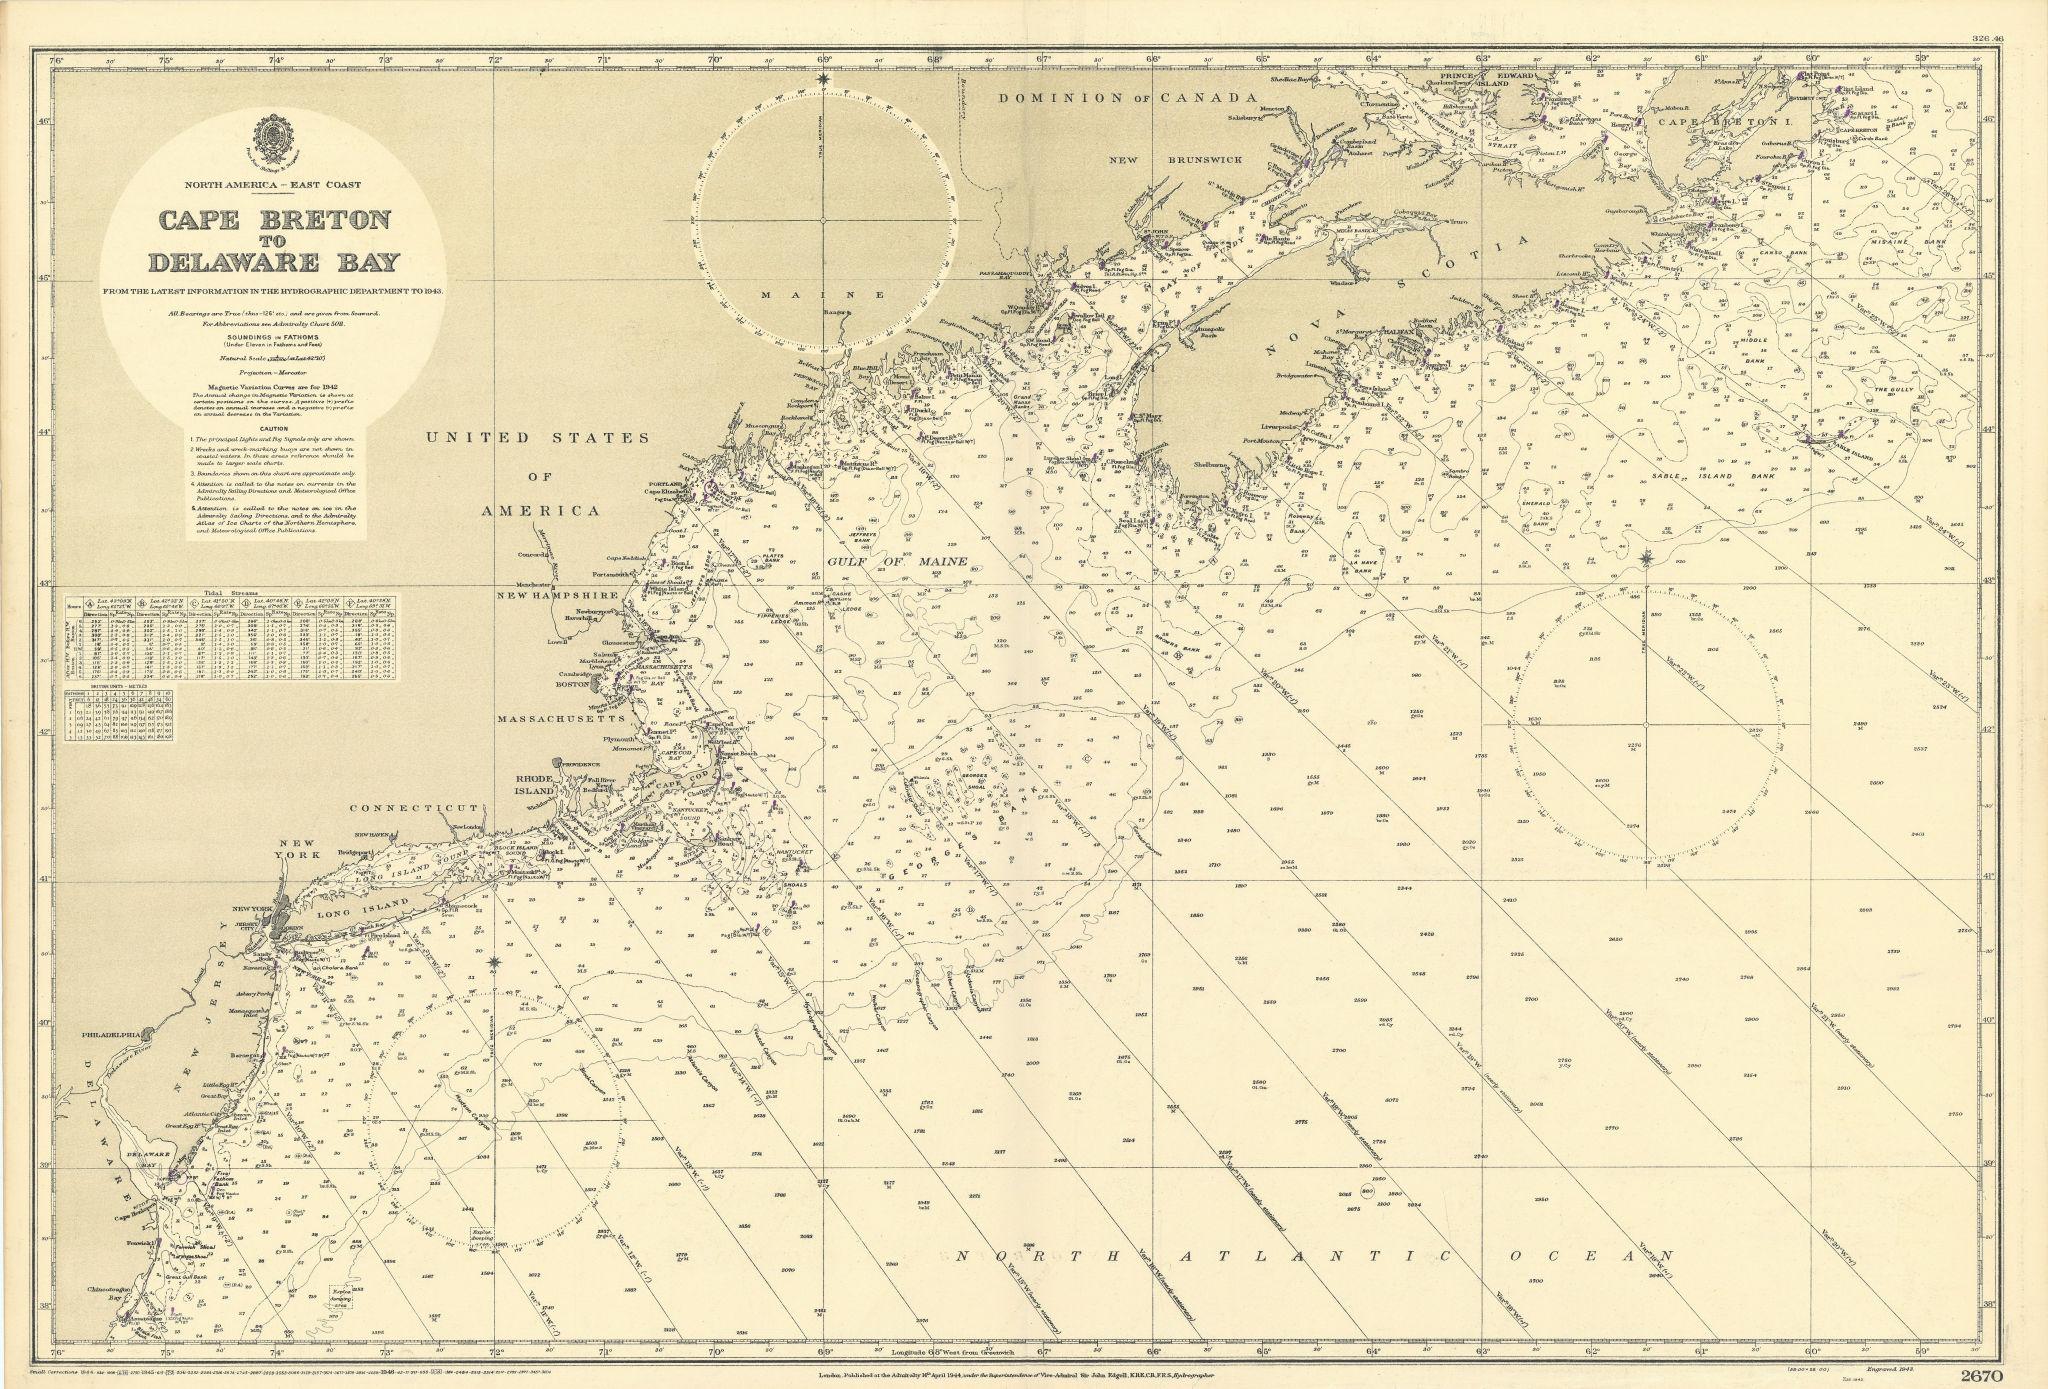 North America east coast Cape Breton-Delaware ADMIRALTY chart 1944 (1946) map